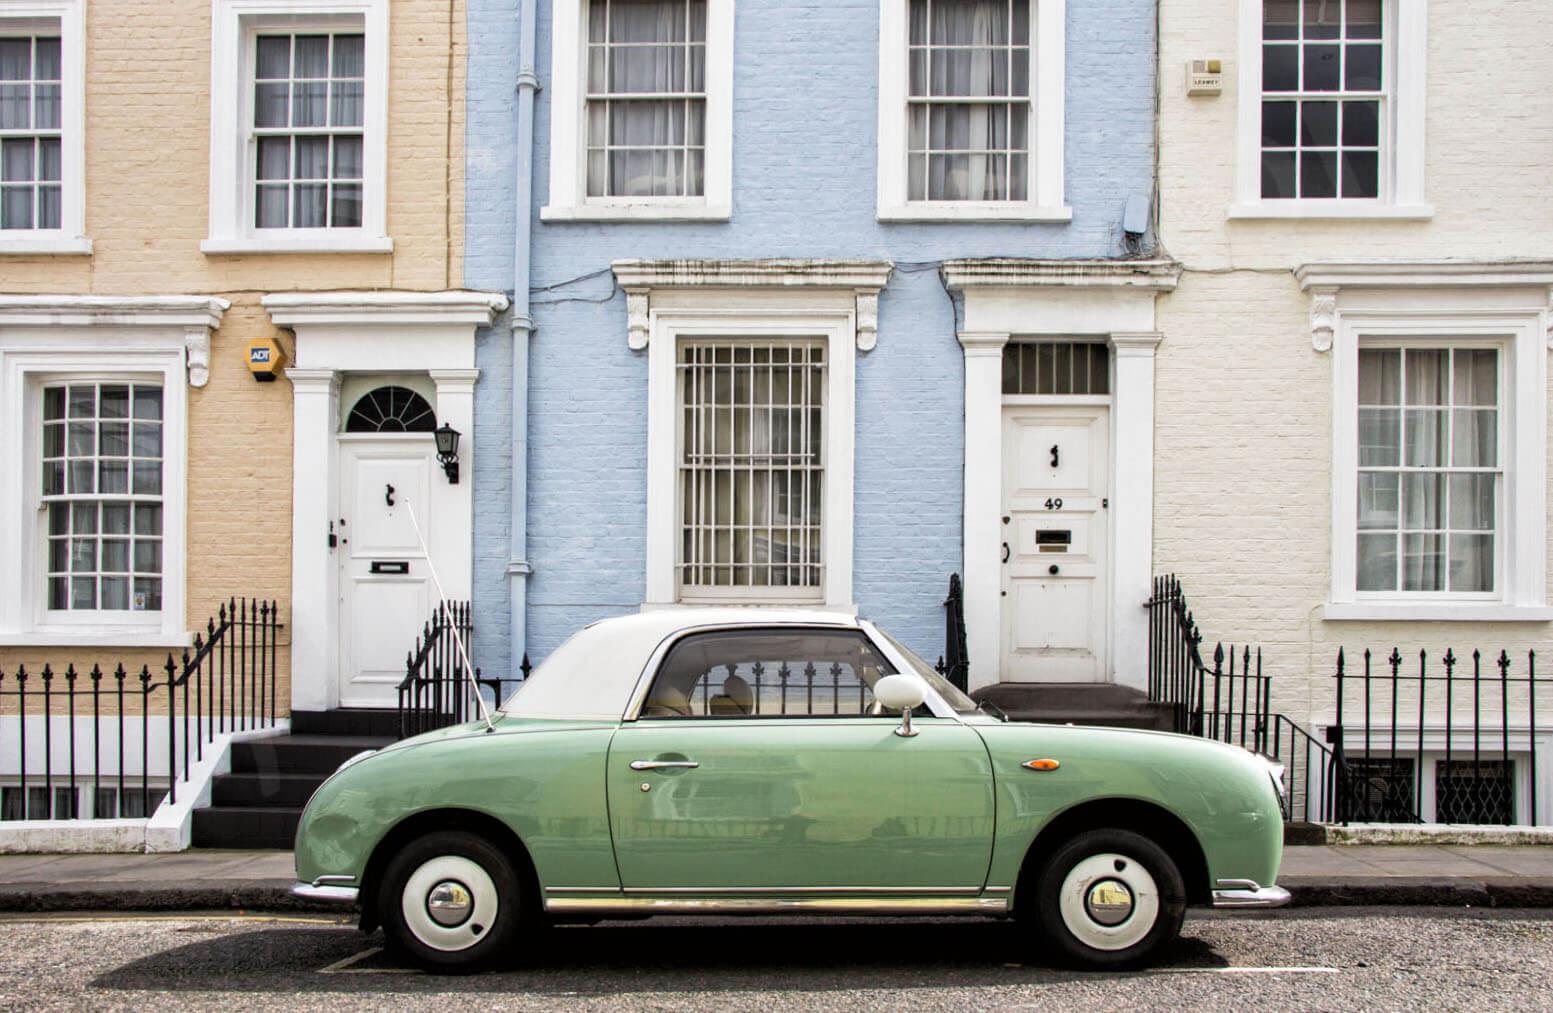 Hillgate Place, Notting Hill, London